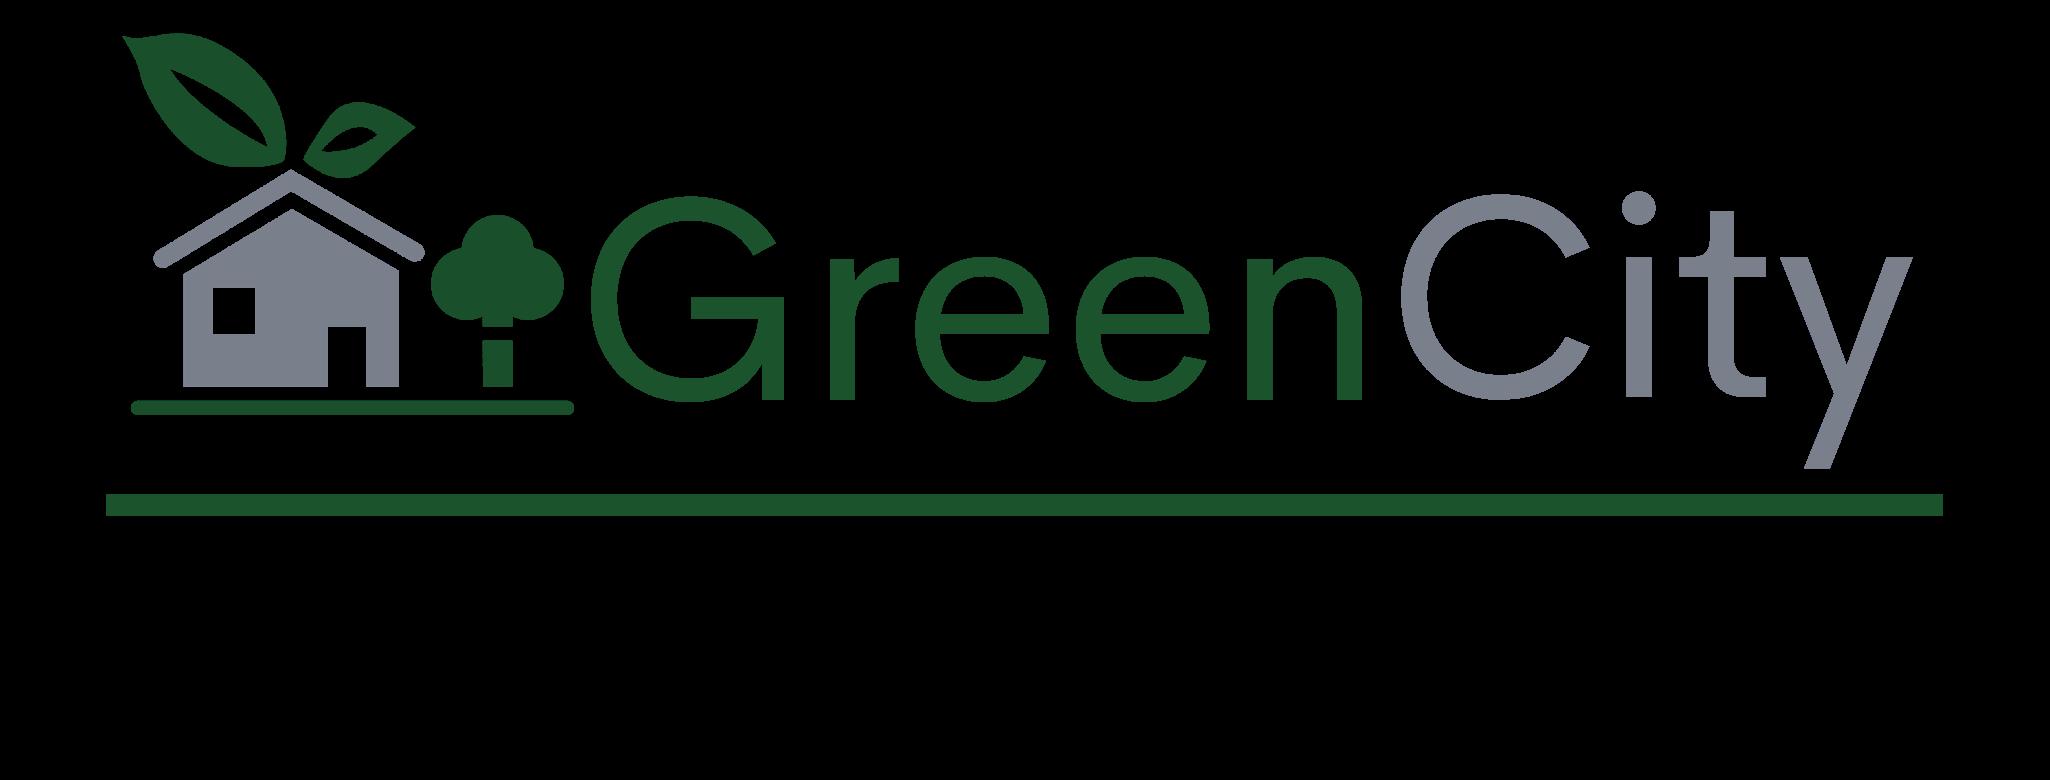 Green City Plumbing